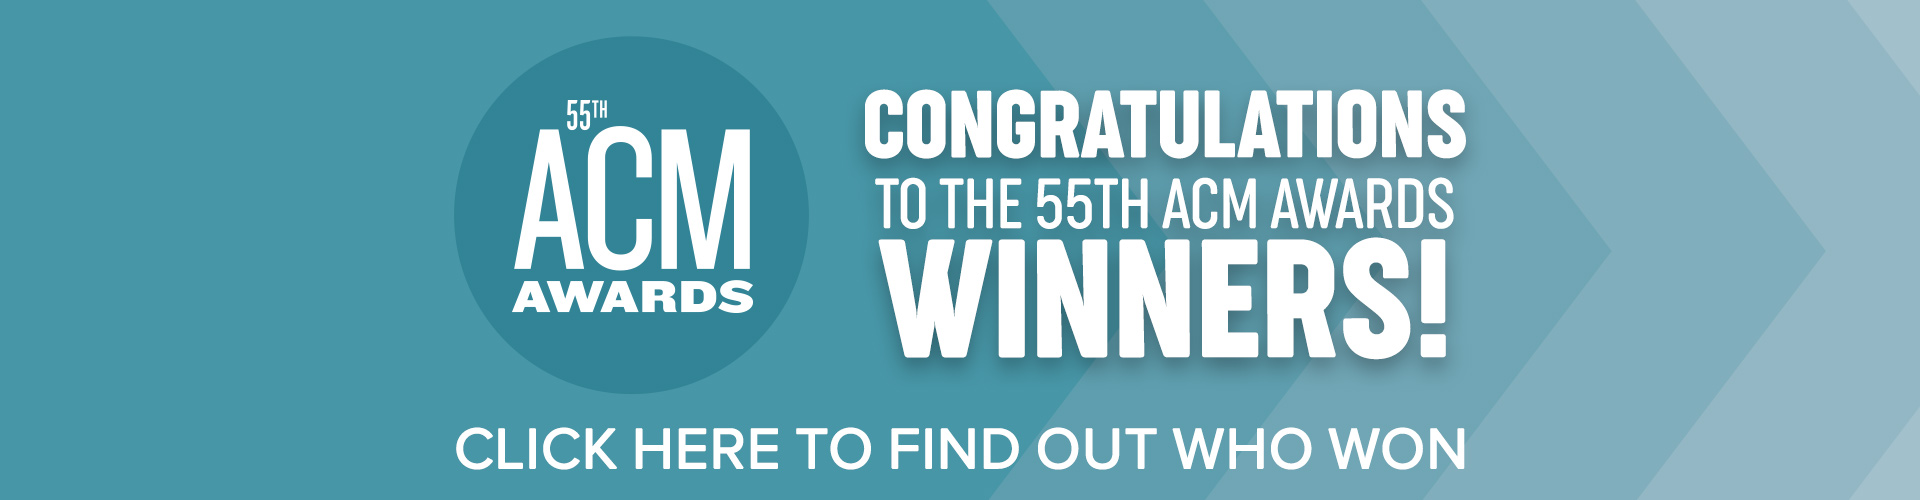 55th ACM winners 1920x500.jpg